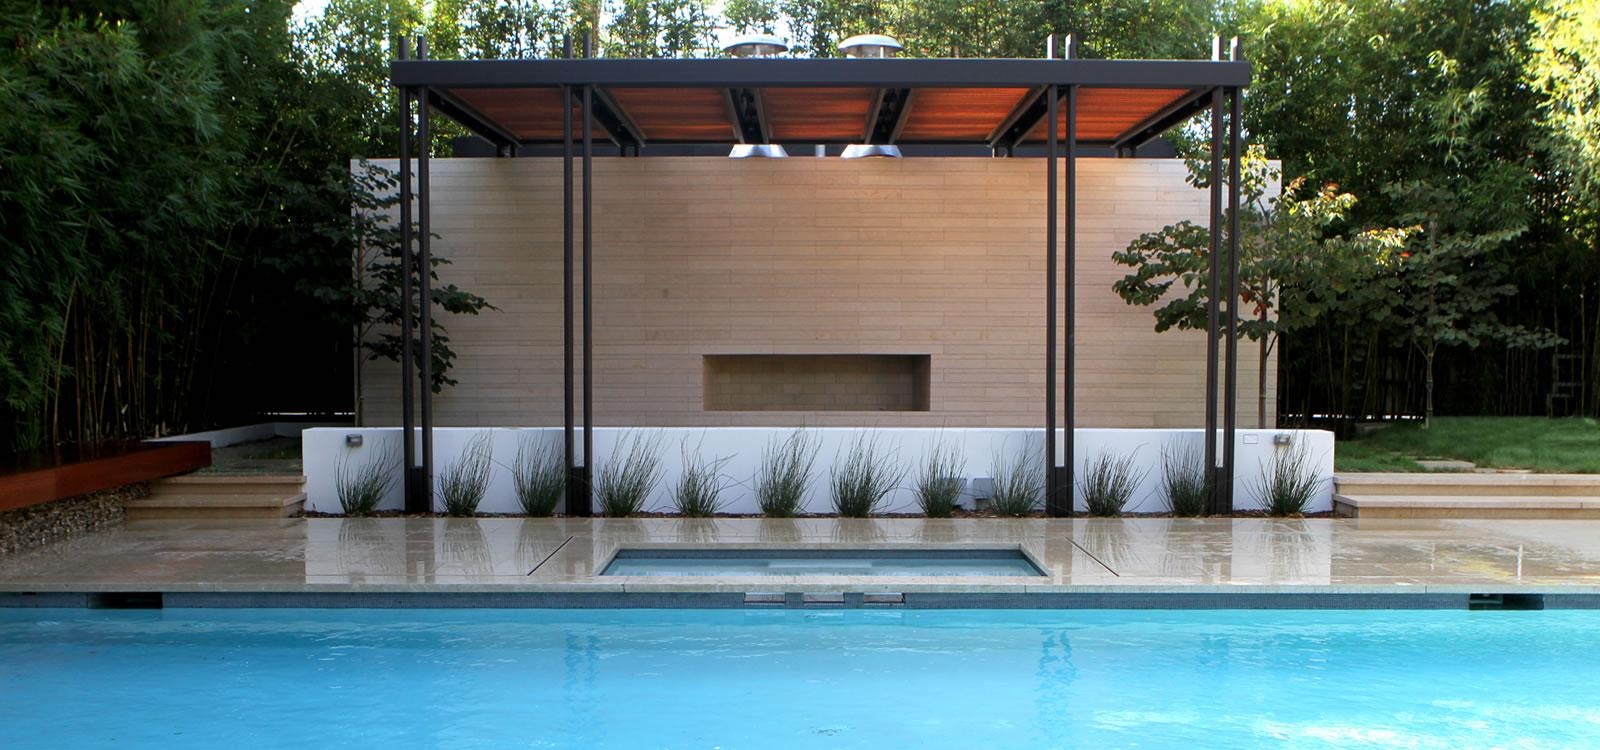 Pool Designer swimming pool designer in deerfield florida Beverly Hills Custom Pool Designer